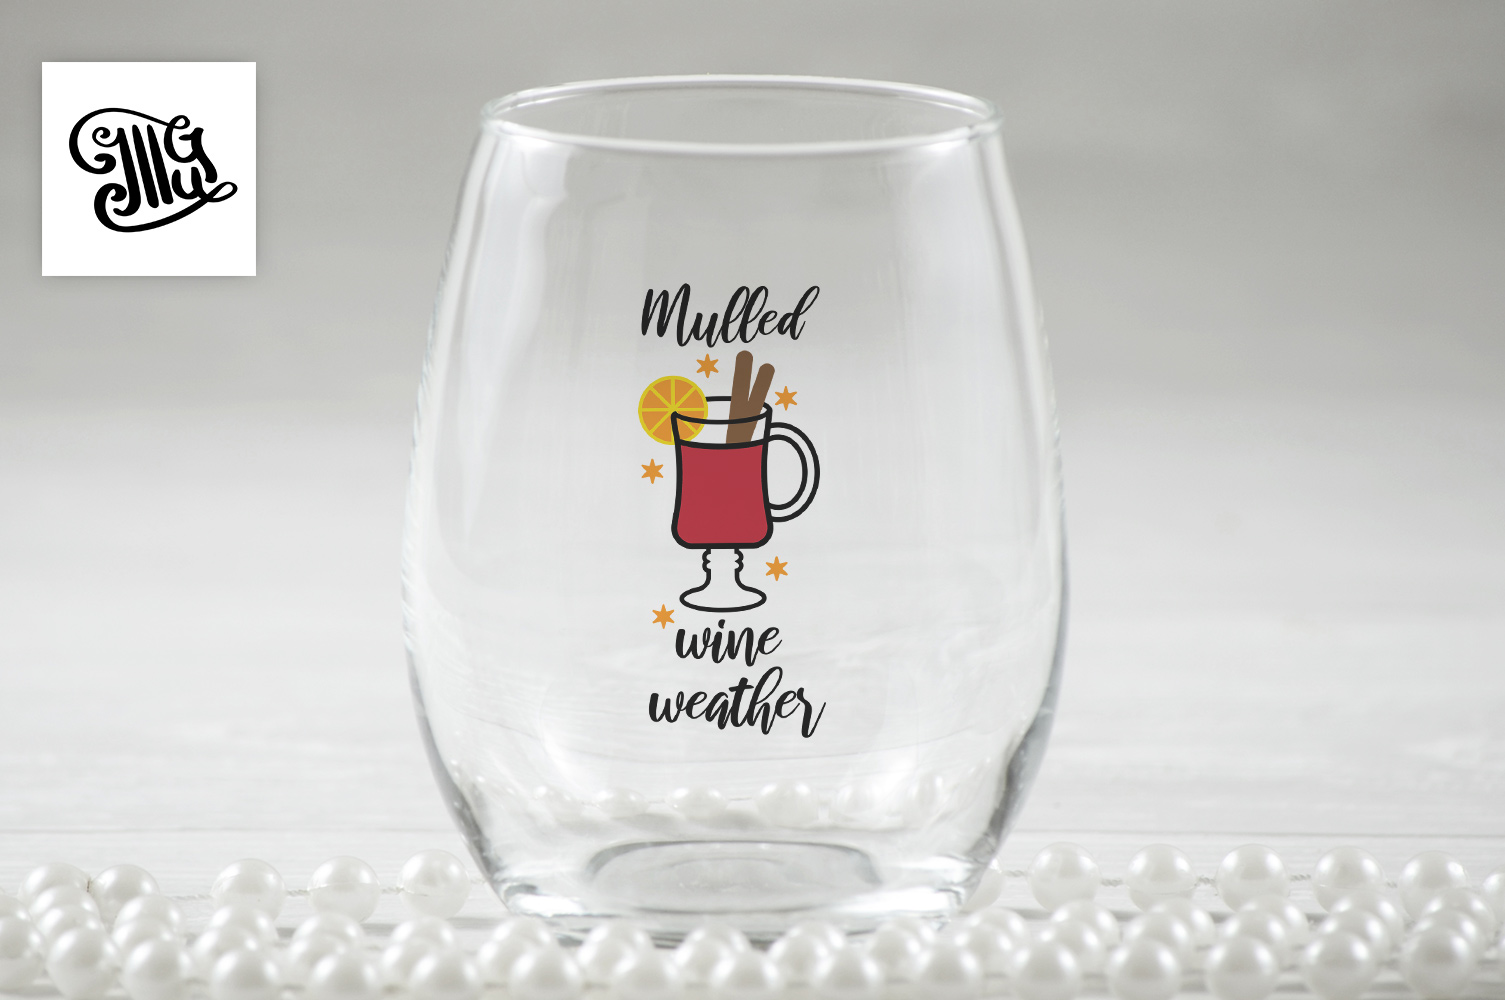 Mulled wine weather - Christmas wine example image 1